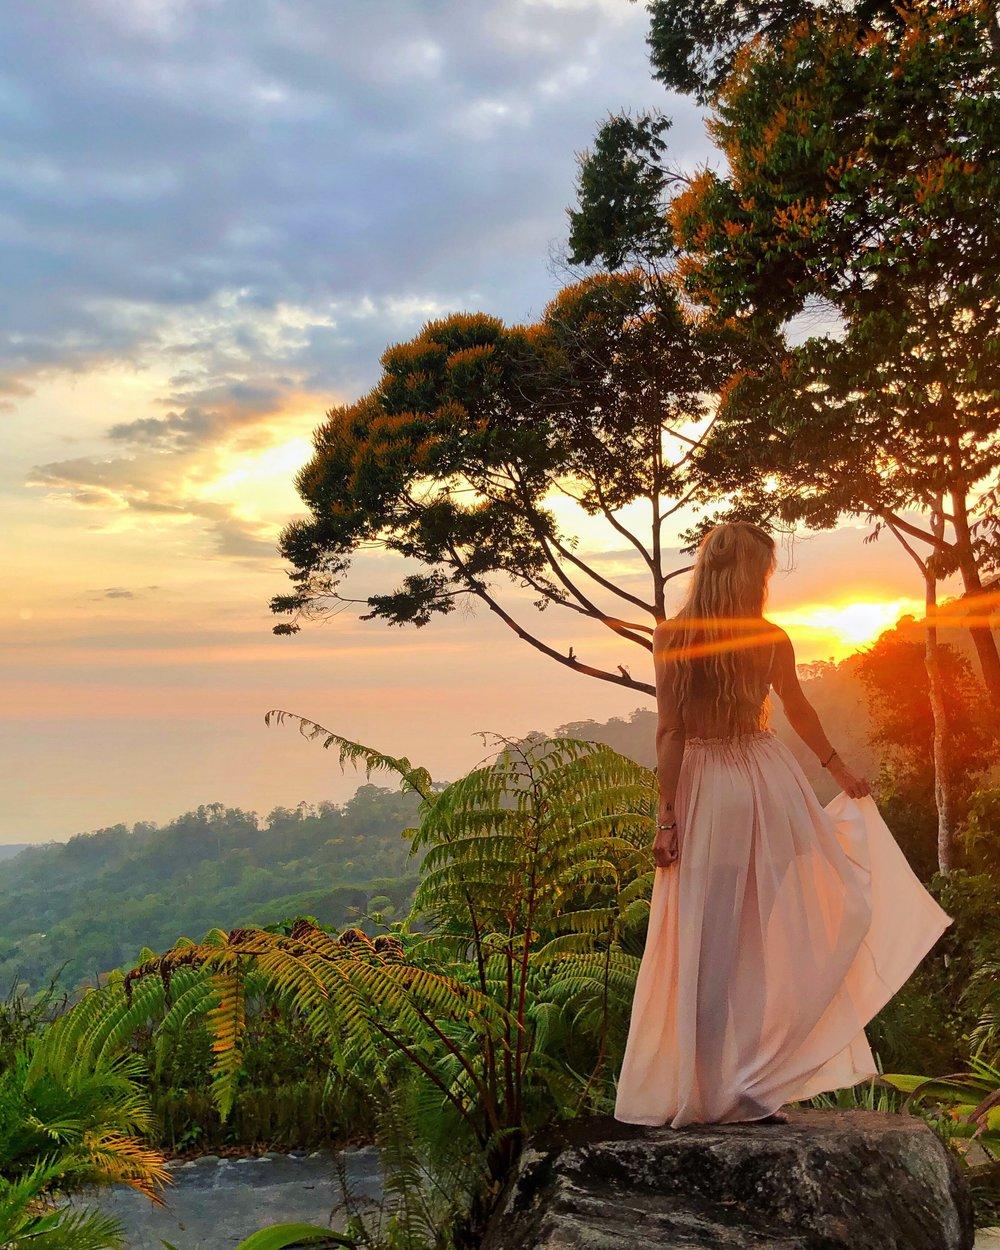 Costa Rica: @Yoga_ky